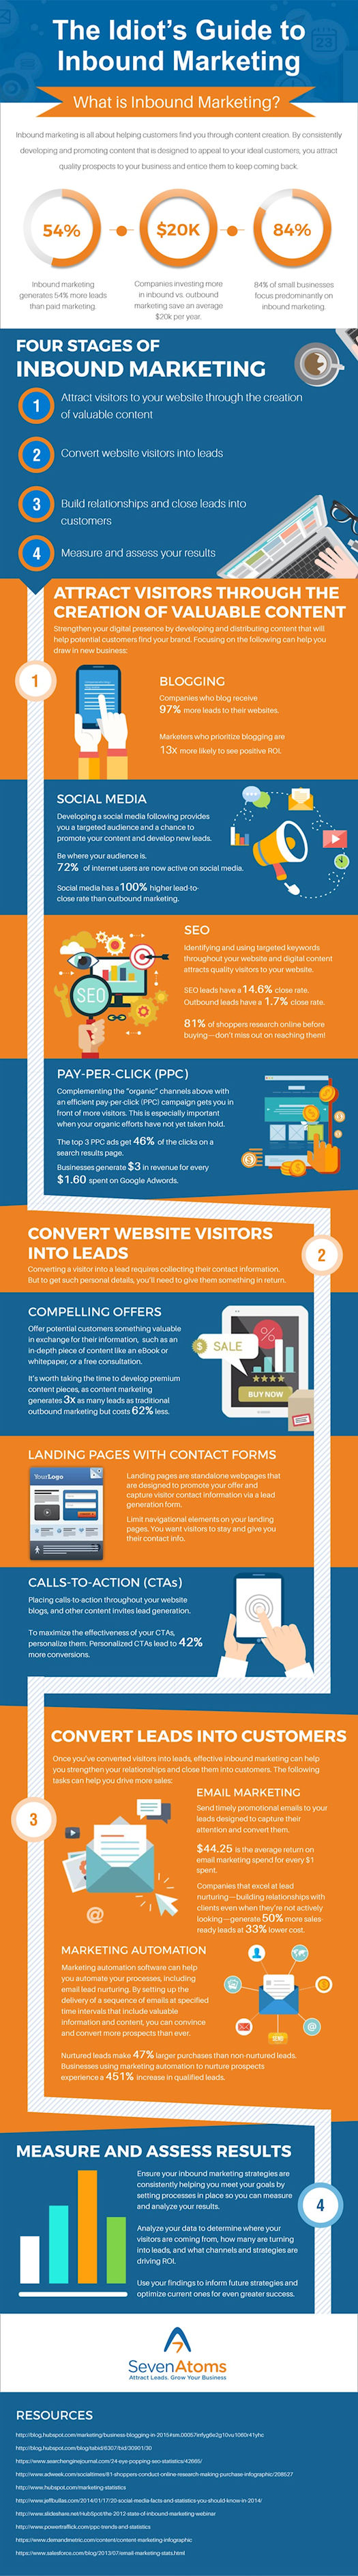 Inbound Marketing Infographic: The Idiot's Guide to Inbound Marketing